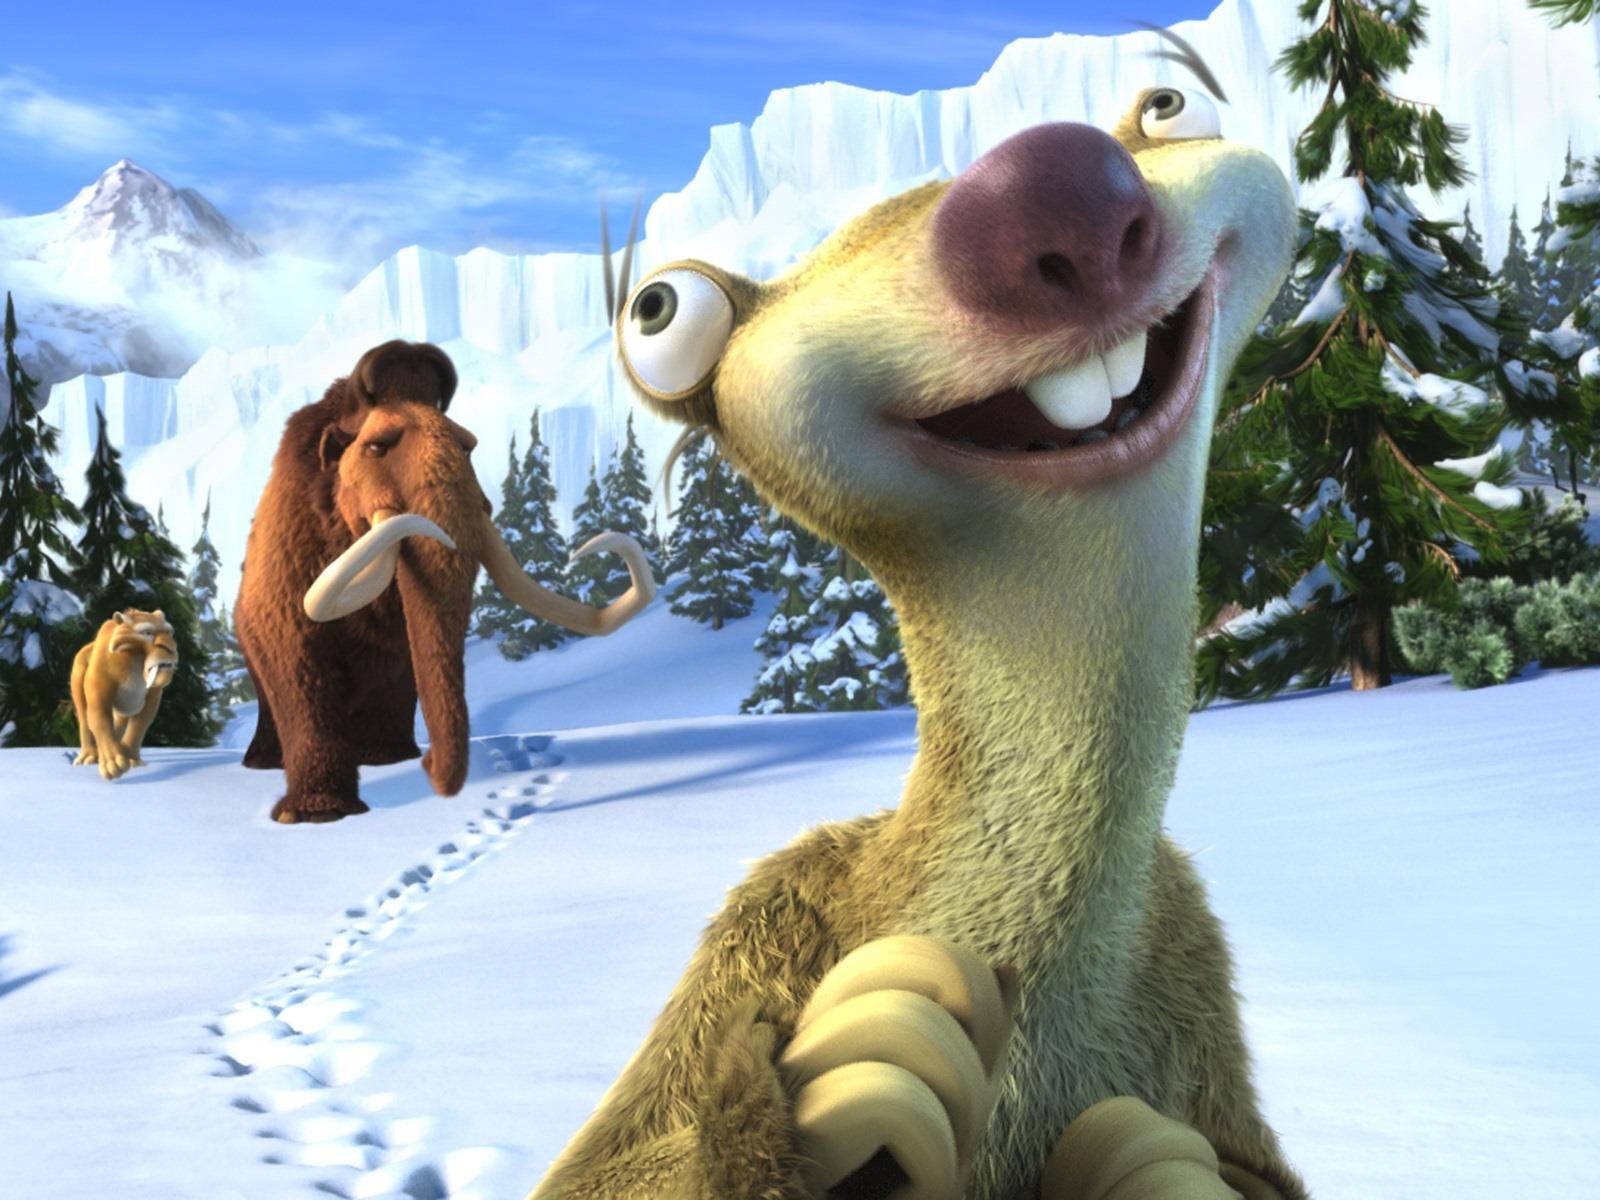 Ice Age HD wallpapers, Desktop wallpaper - most viewed